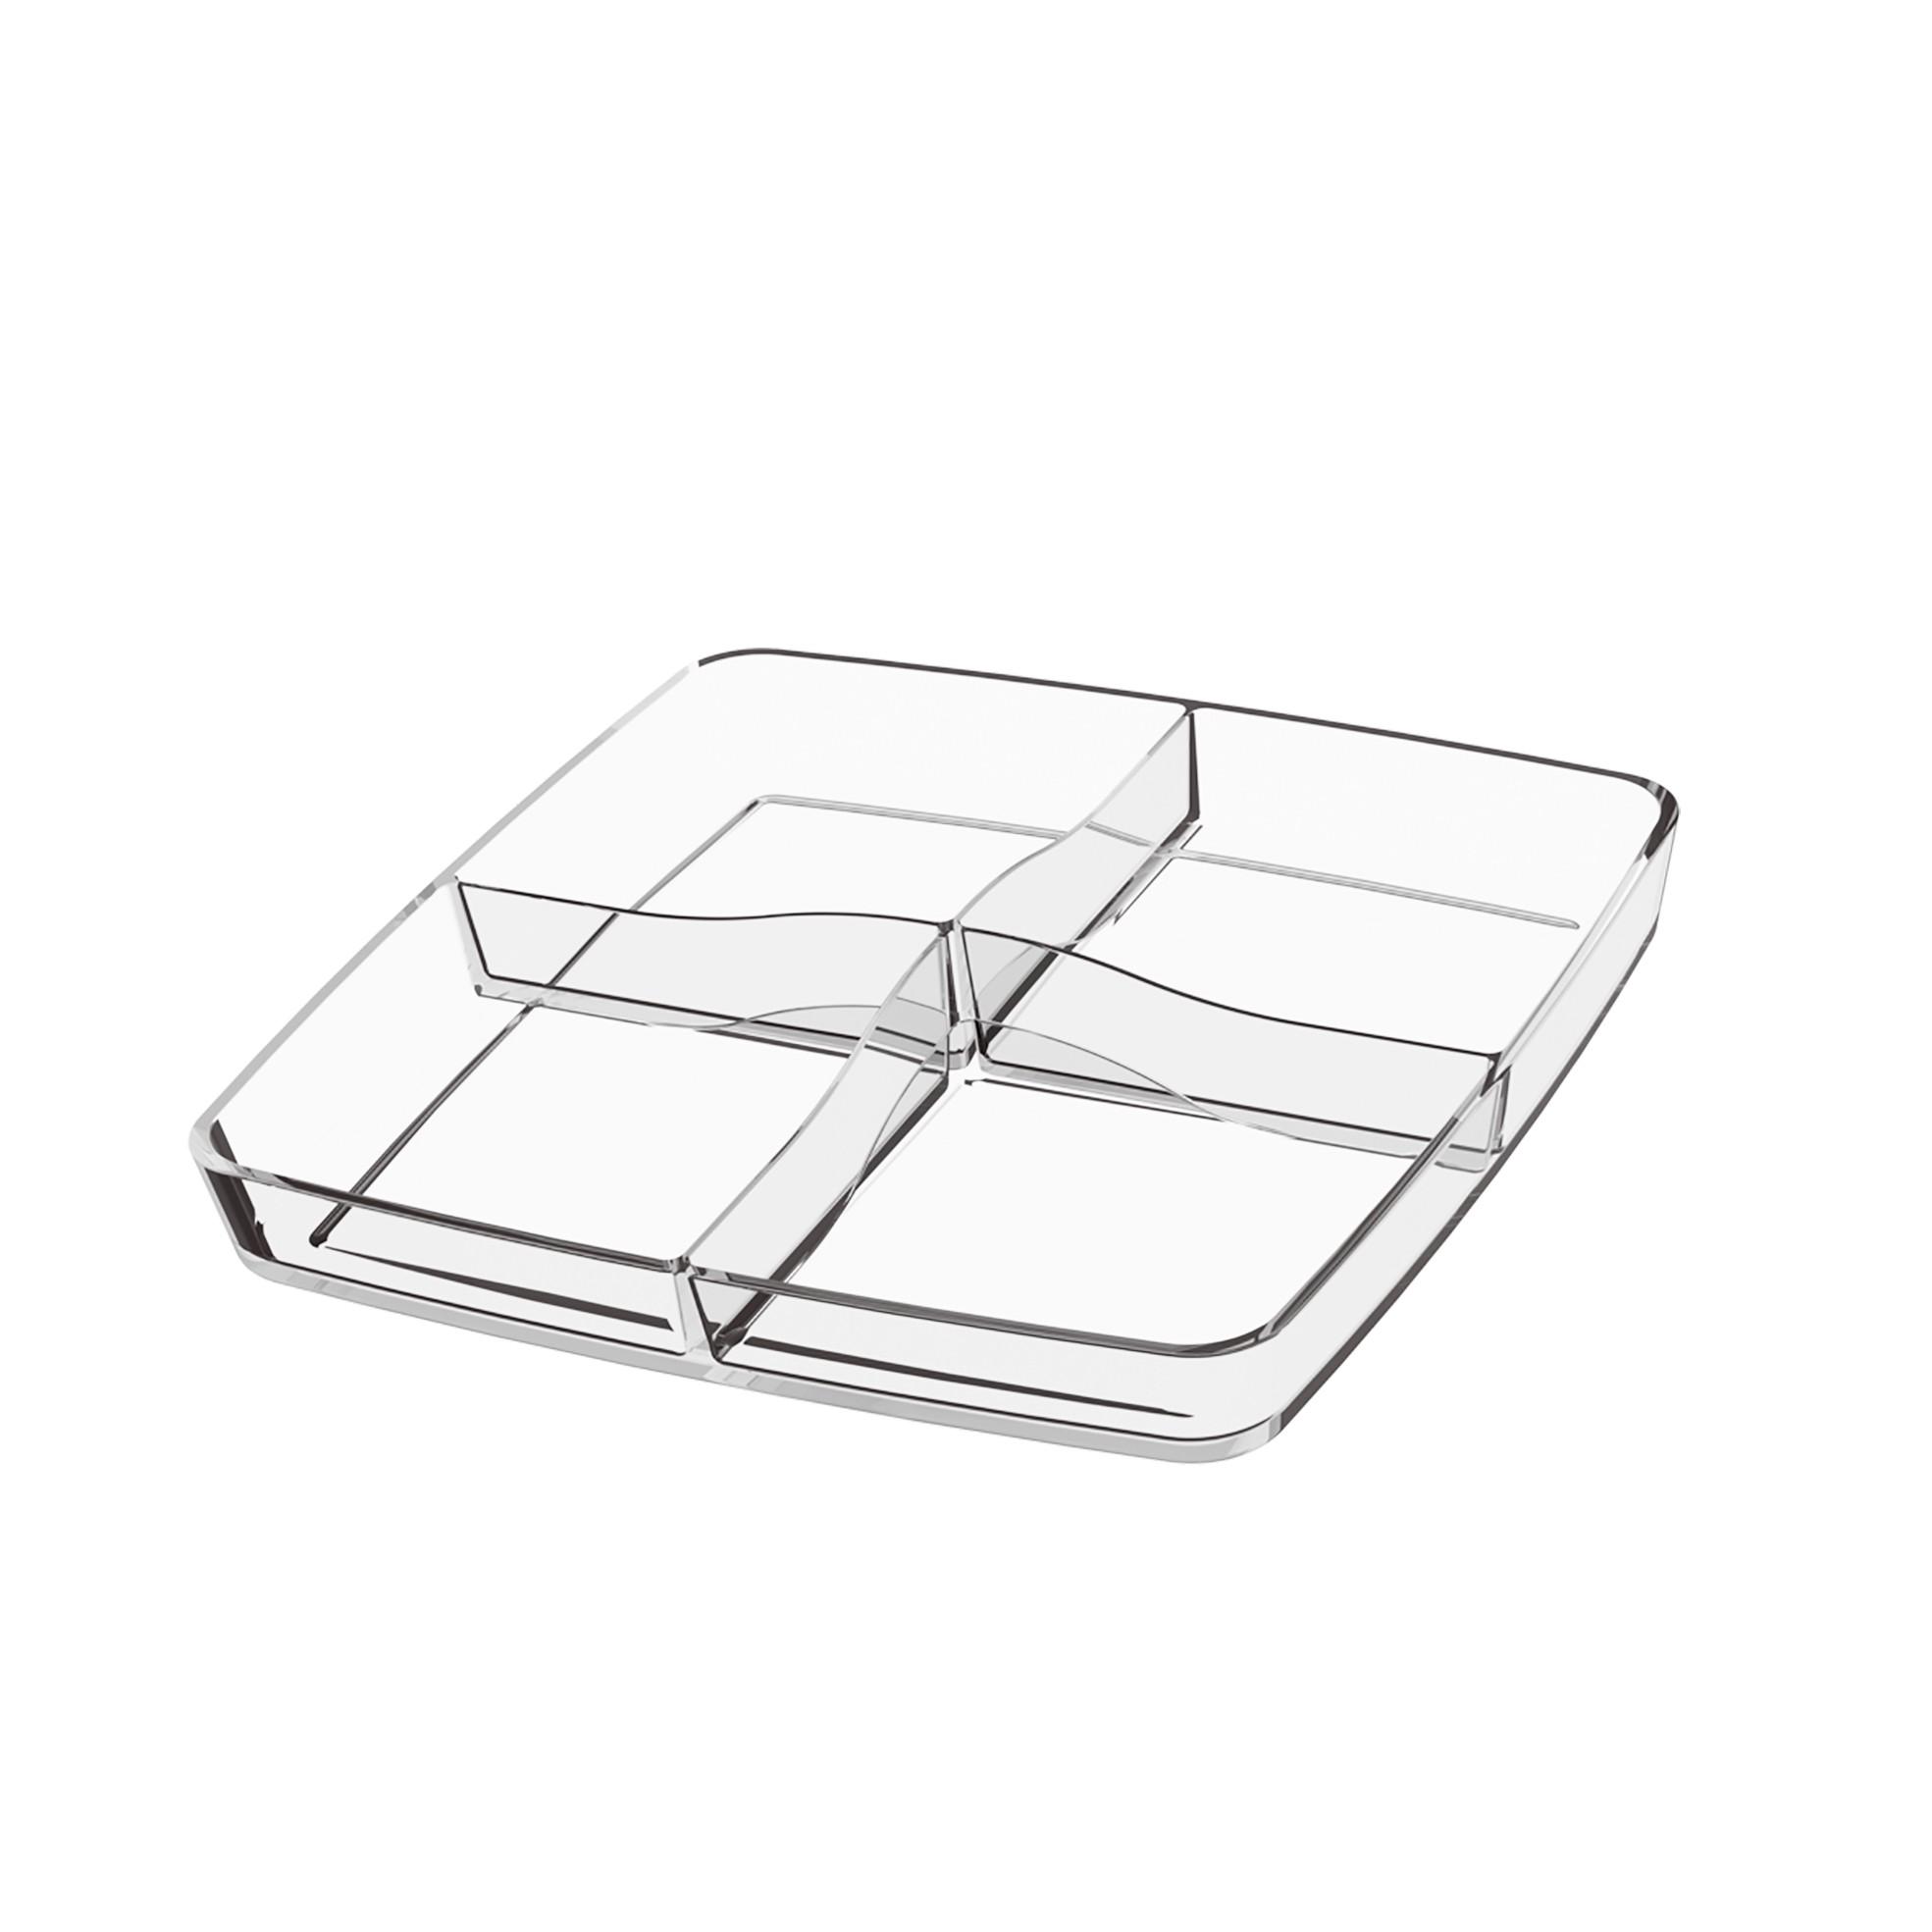 Petisqueira de Plastico Incolor 207060009 - Coza